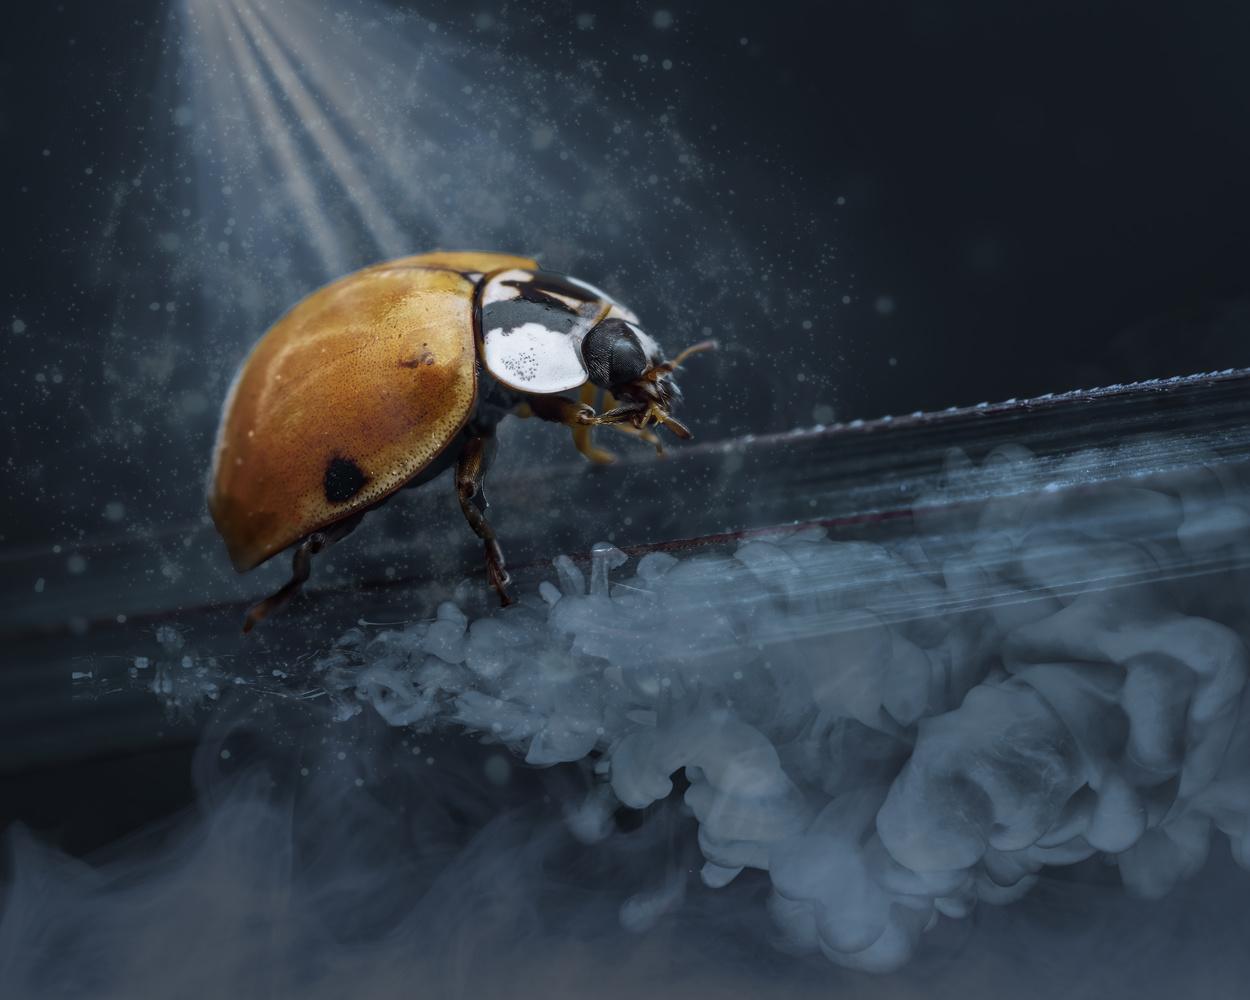 Fantasy ladybug by Skyler Ewing